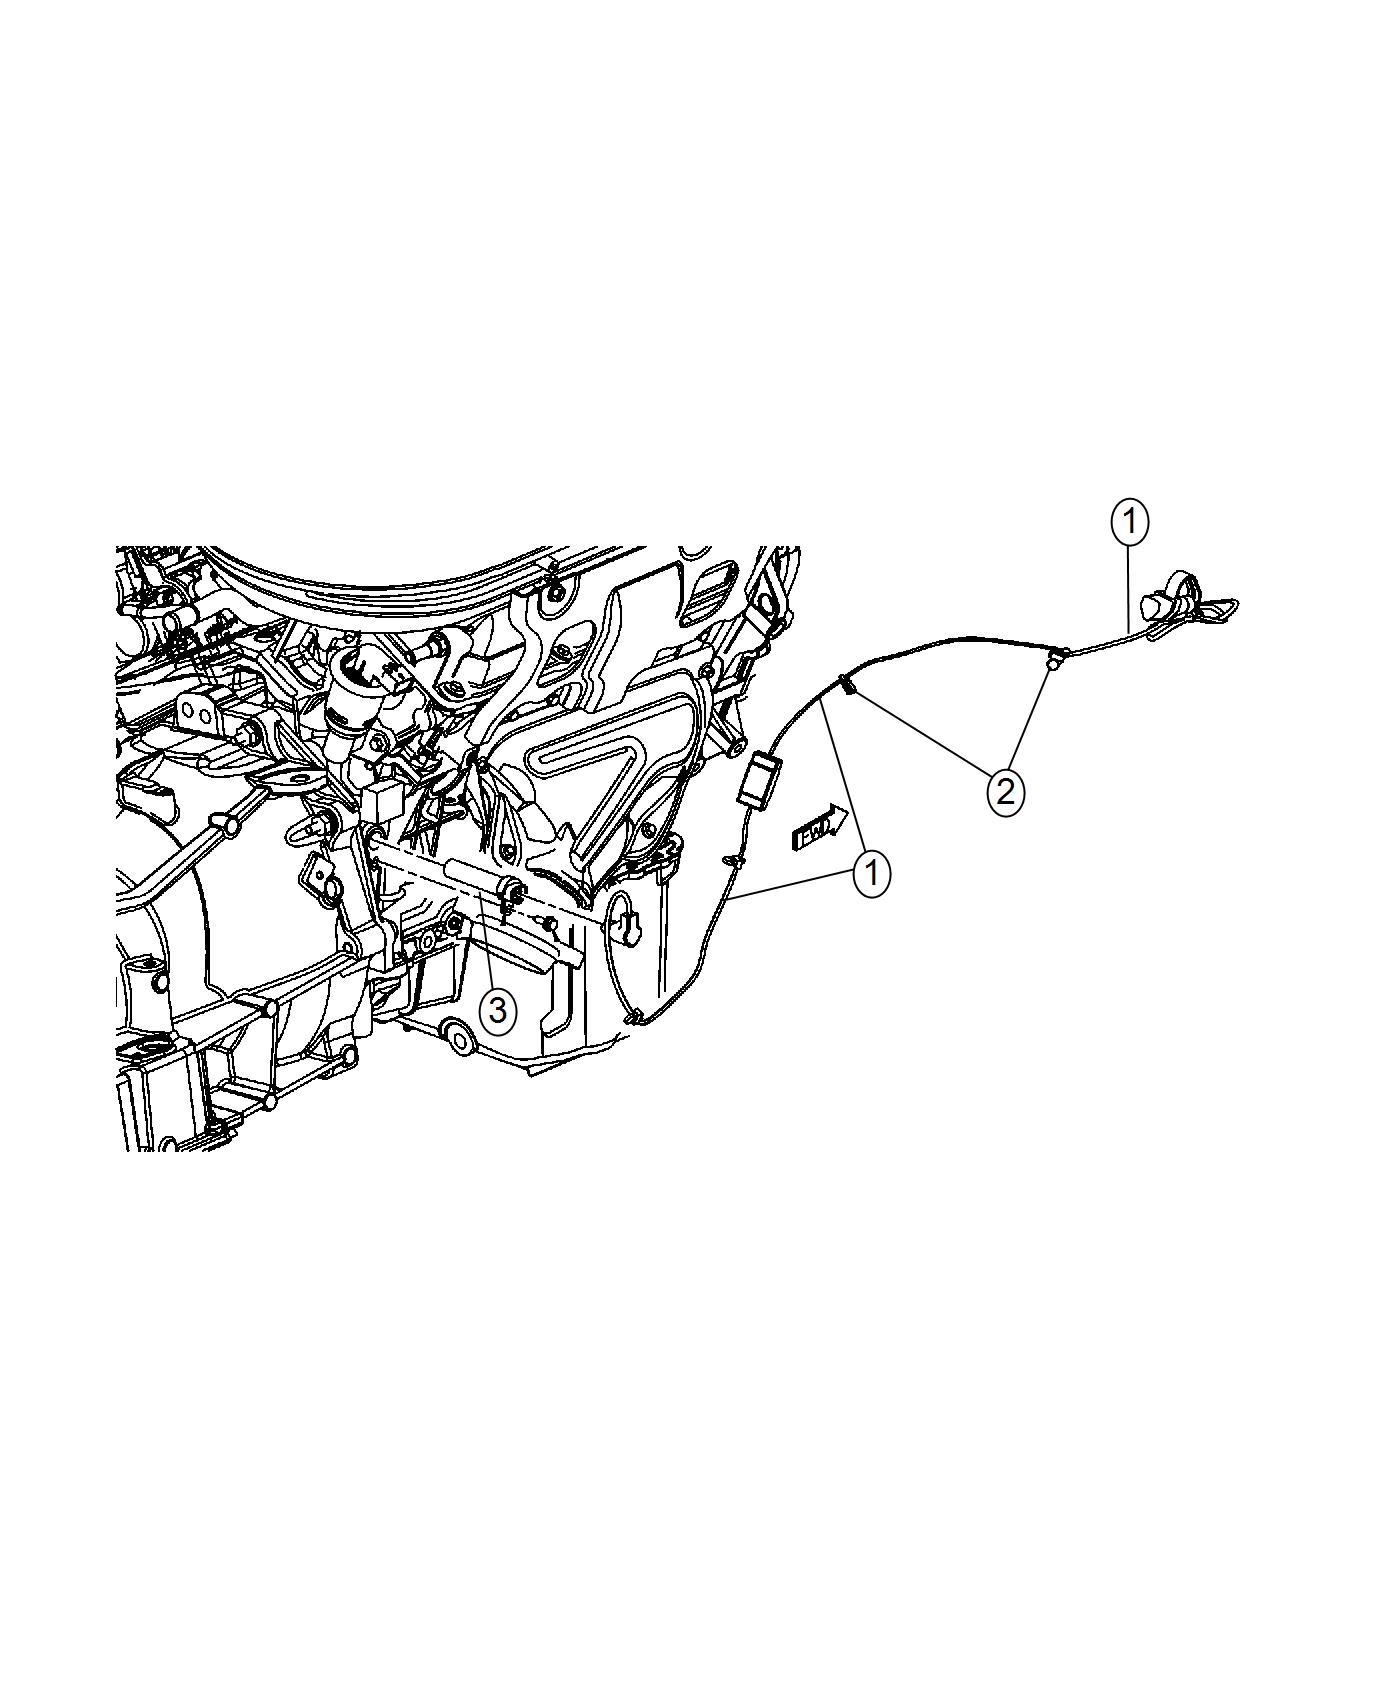 Ram Heater Engine Blocksel Cylinder